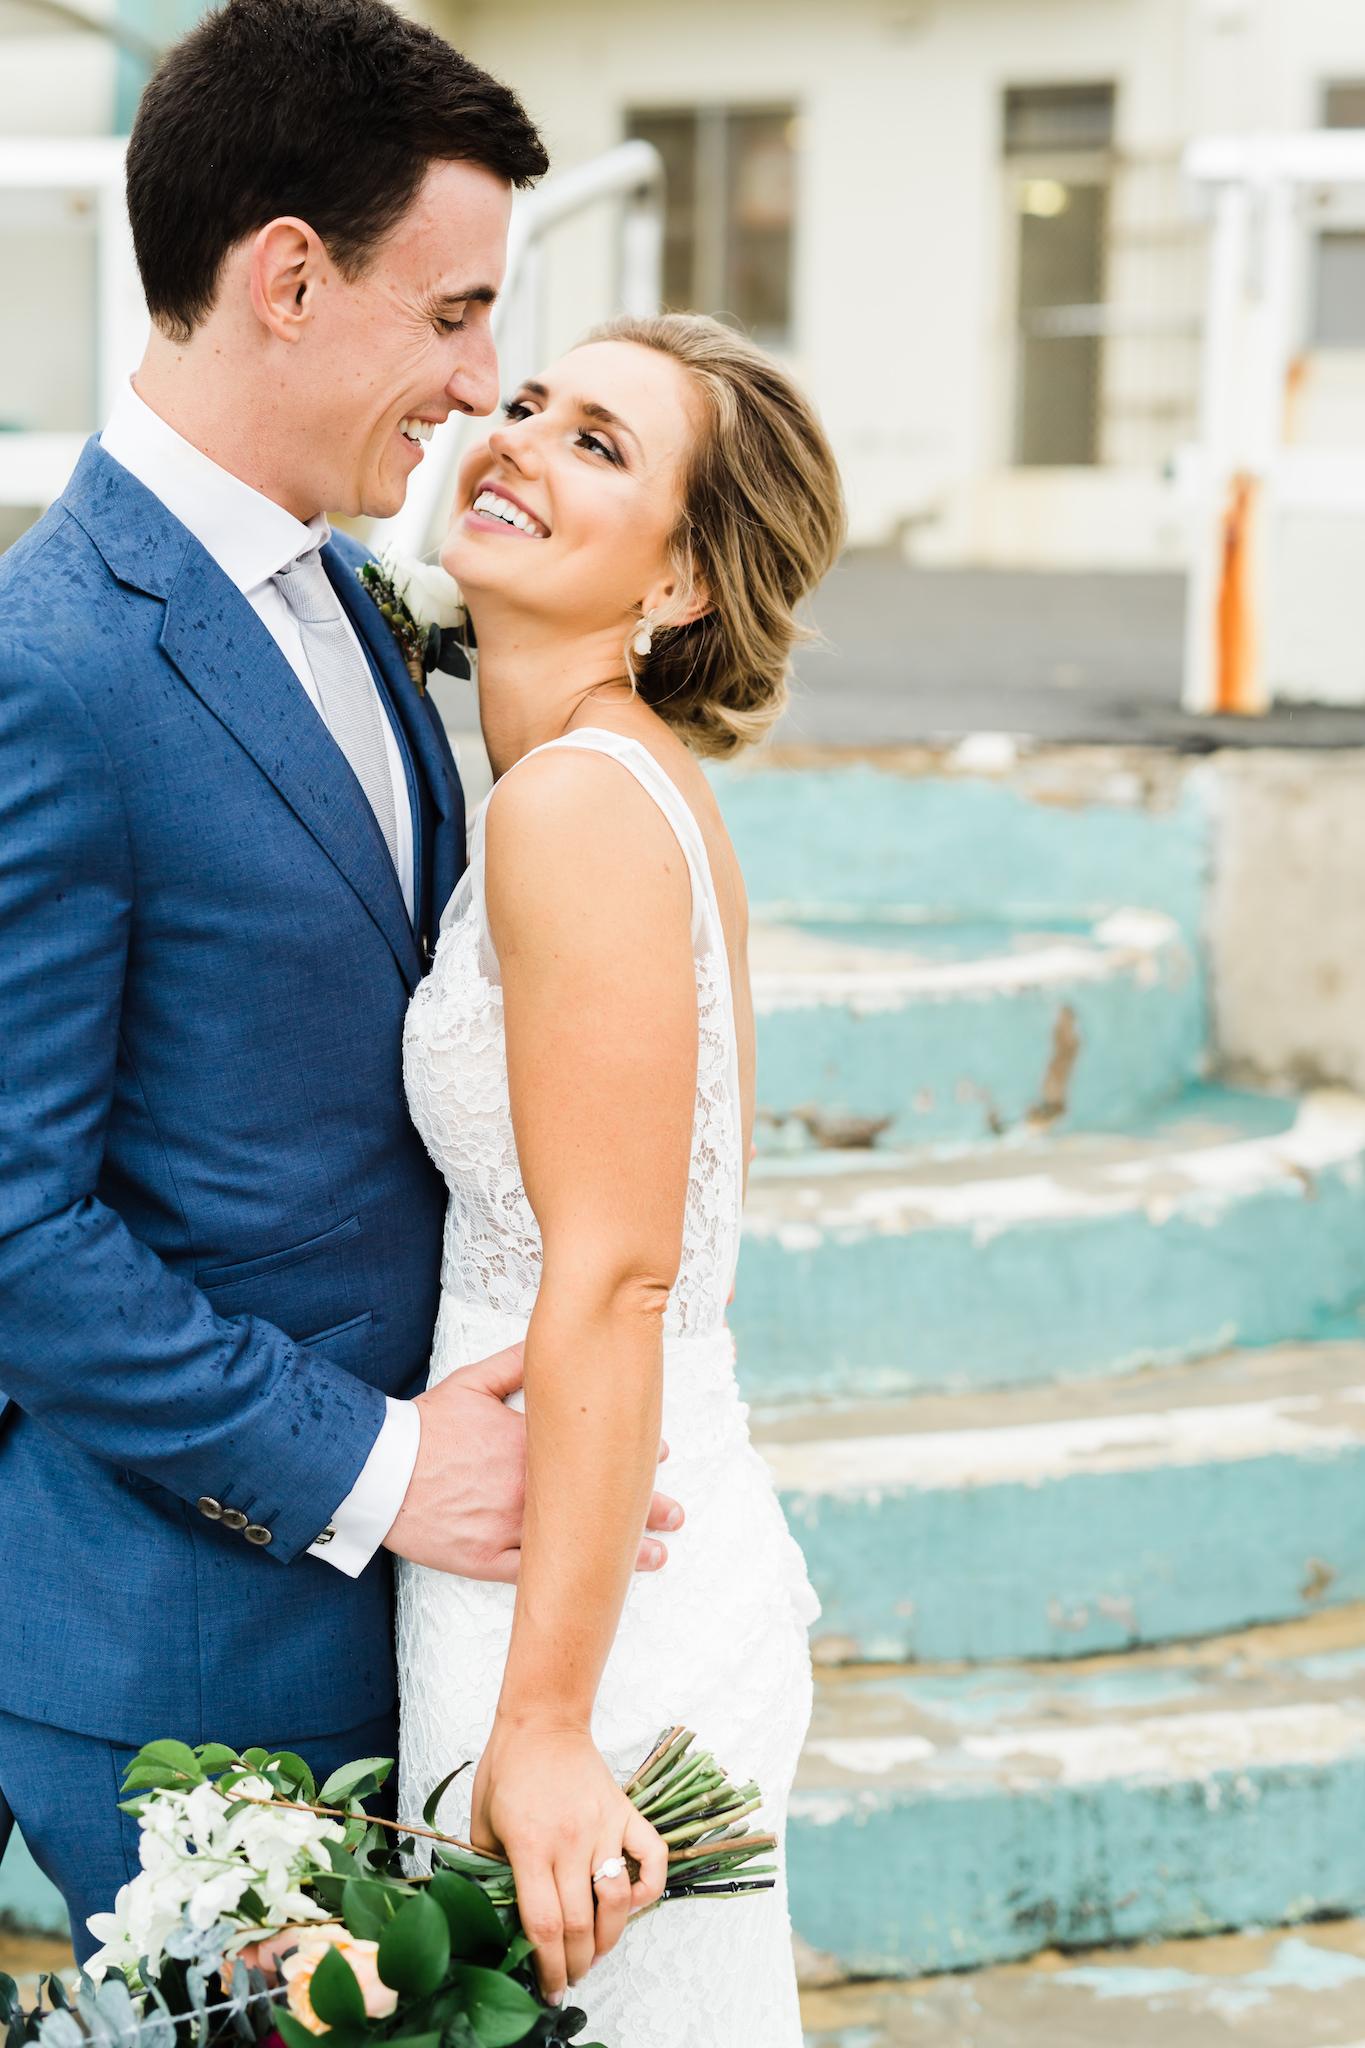 529-SOPHIE  DYLAN WEDDING.jpg